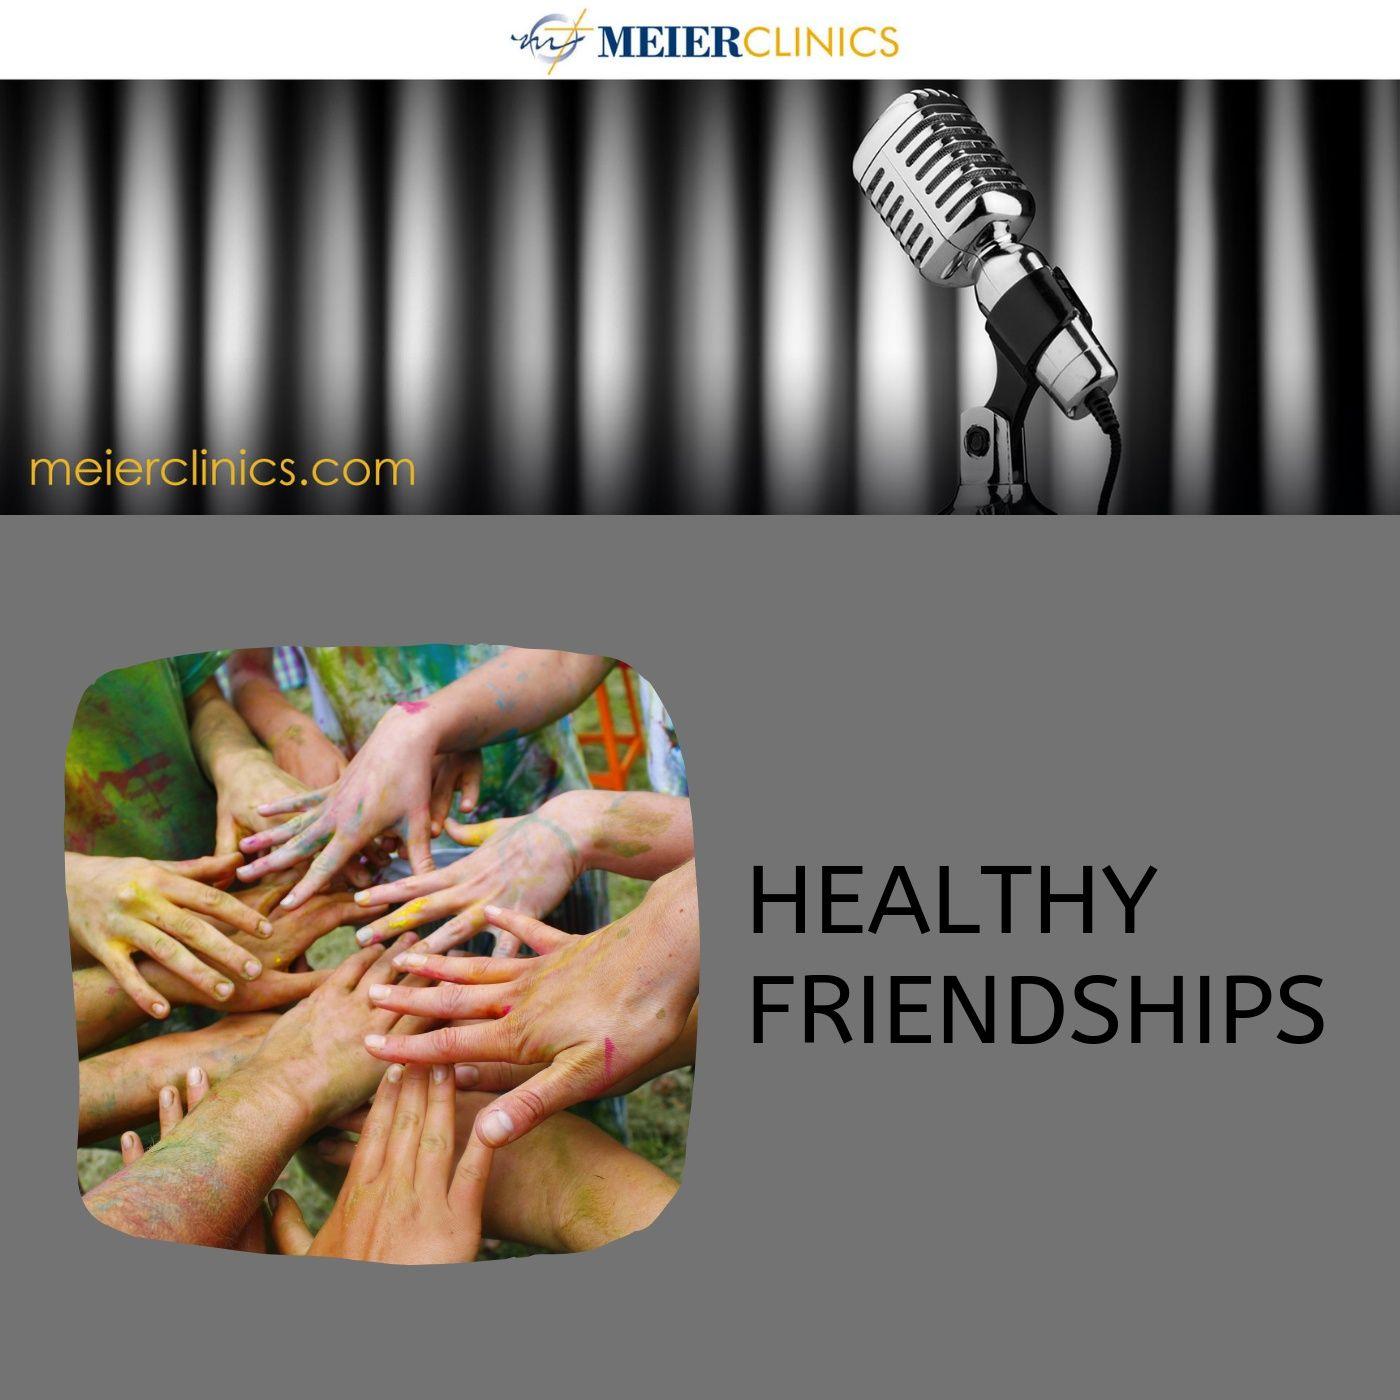 Healthy Friendships